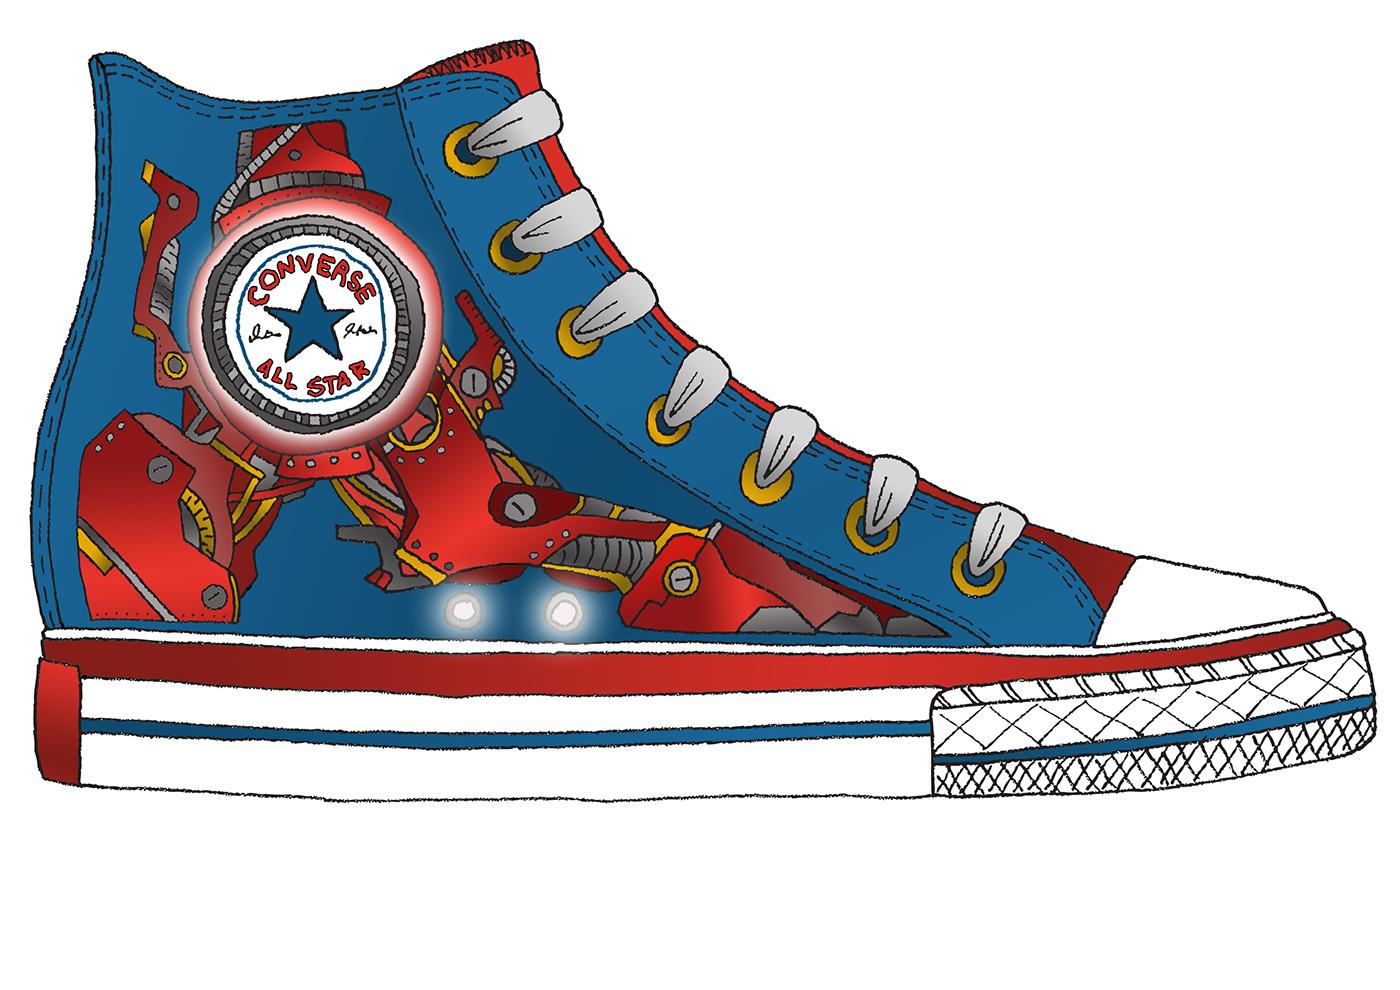 2ddc692ccd4 Converse Shoe Clipart at GetDrawings.com